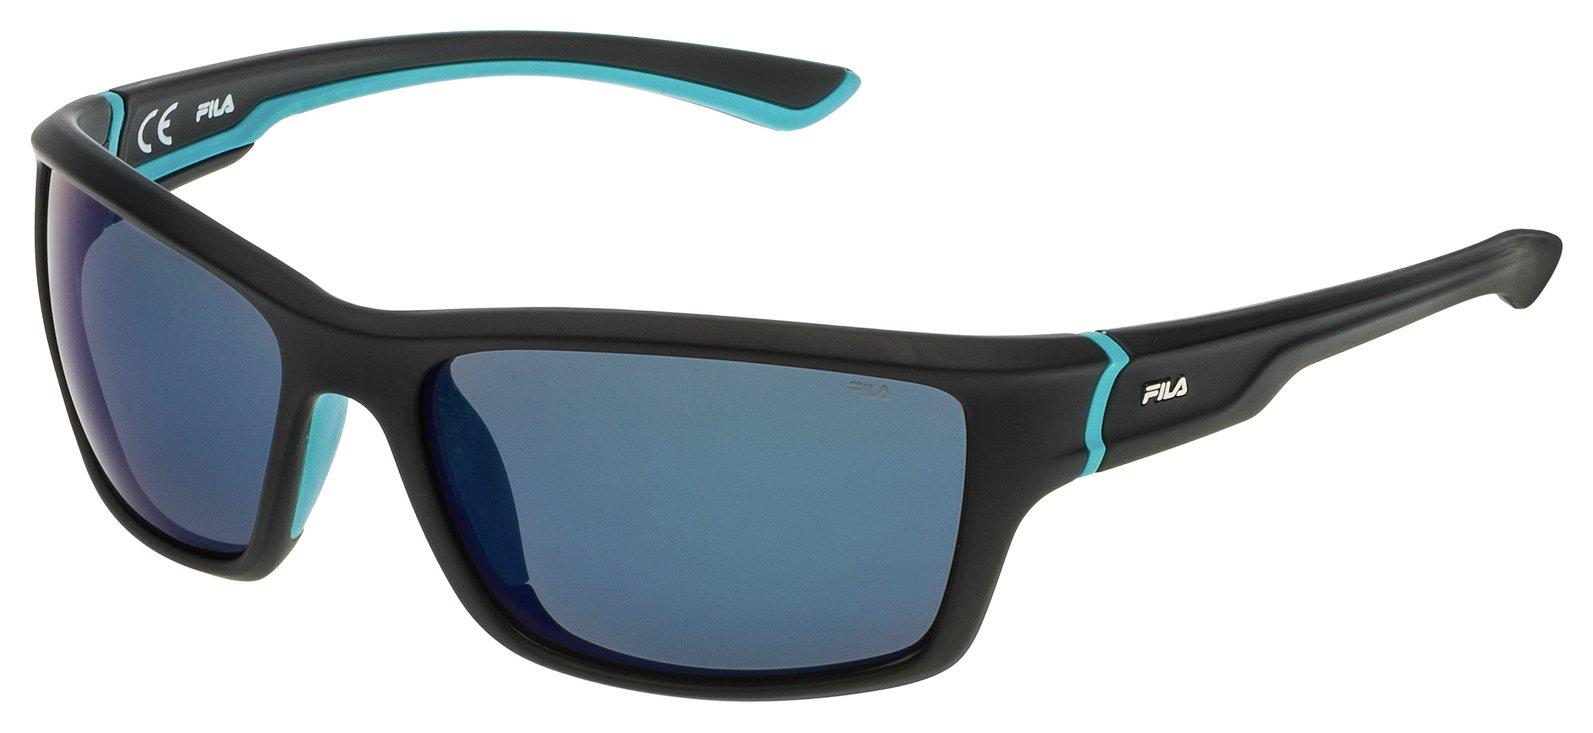 Image of Fila Shiny Black Blue Lens Sunglasses.